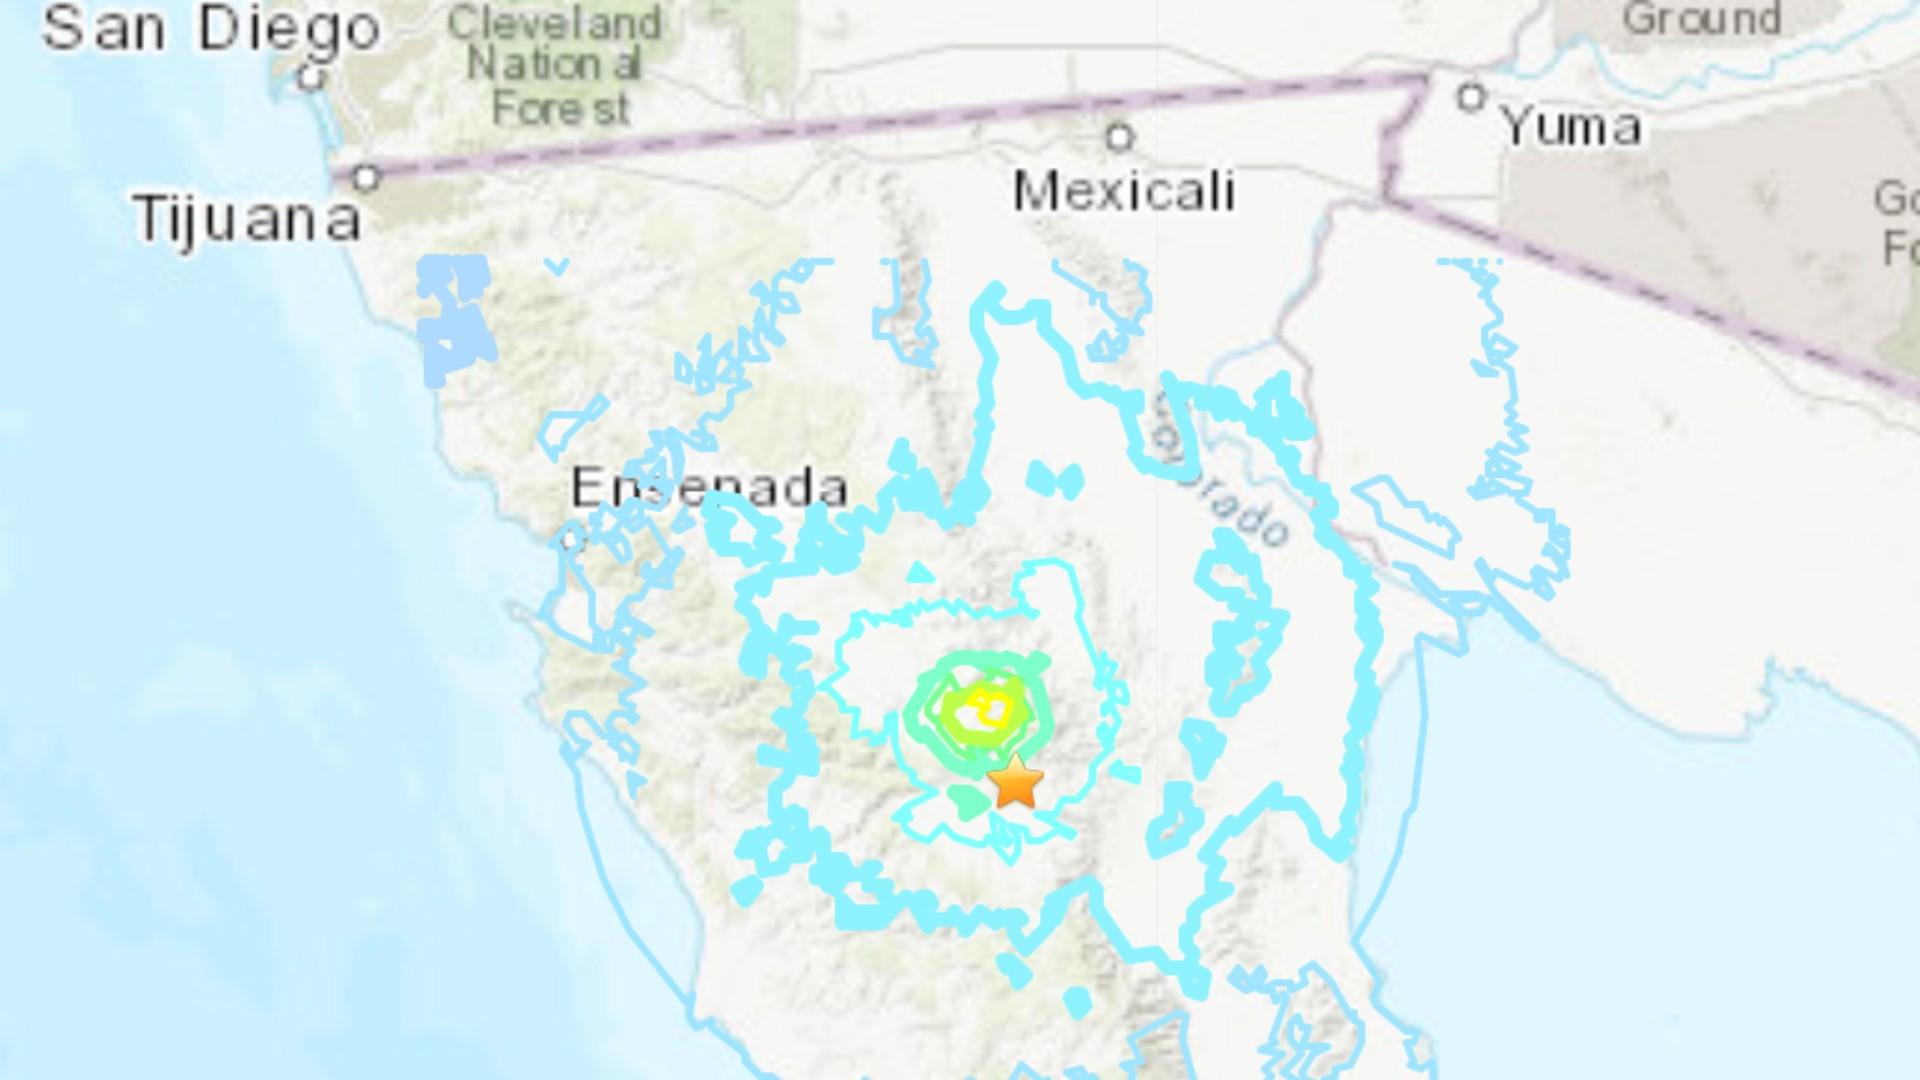 (U.S. Geological Survey)